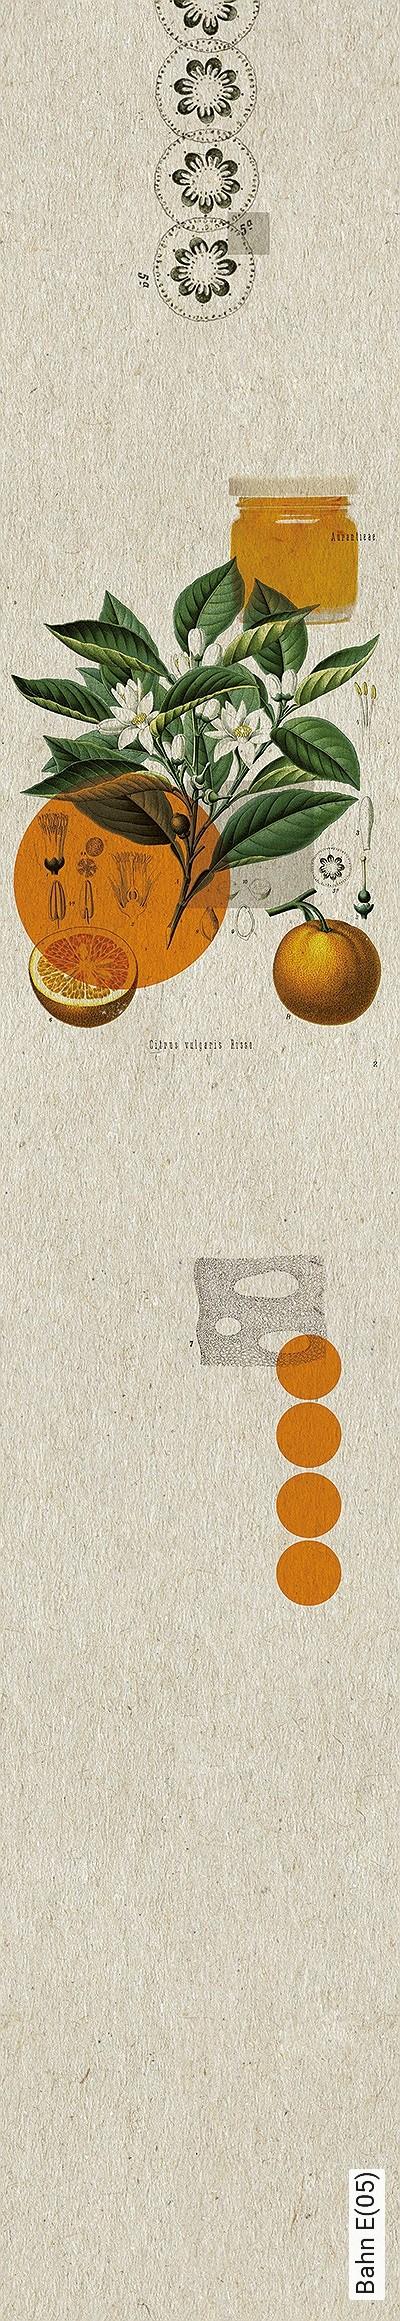 Bahn-E(05)-Früchte-Moderne-Muster-Orange-Creme